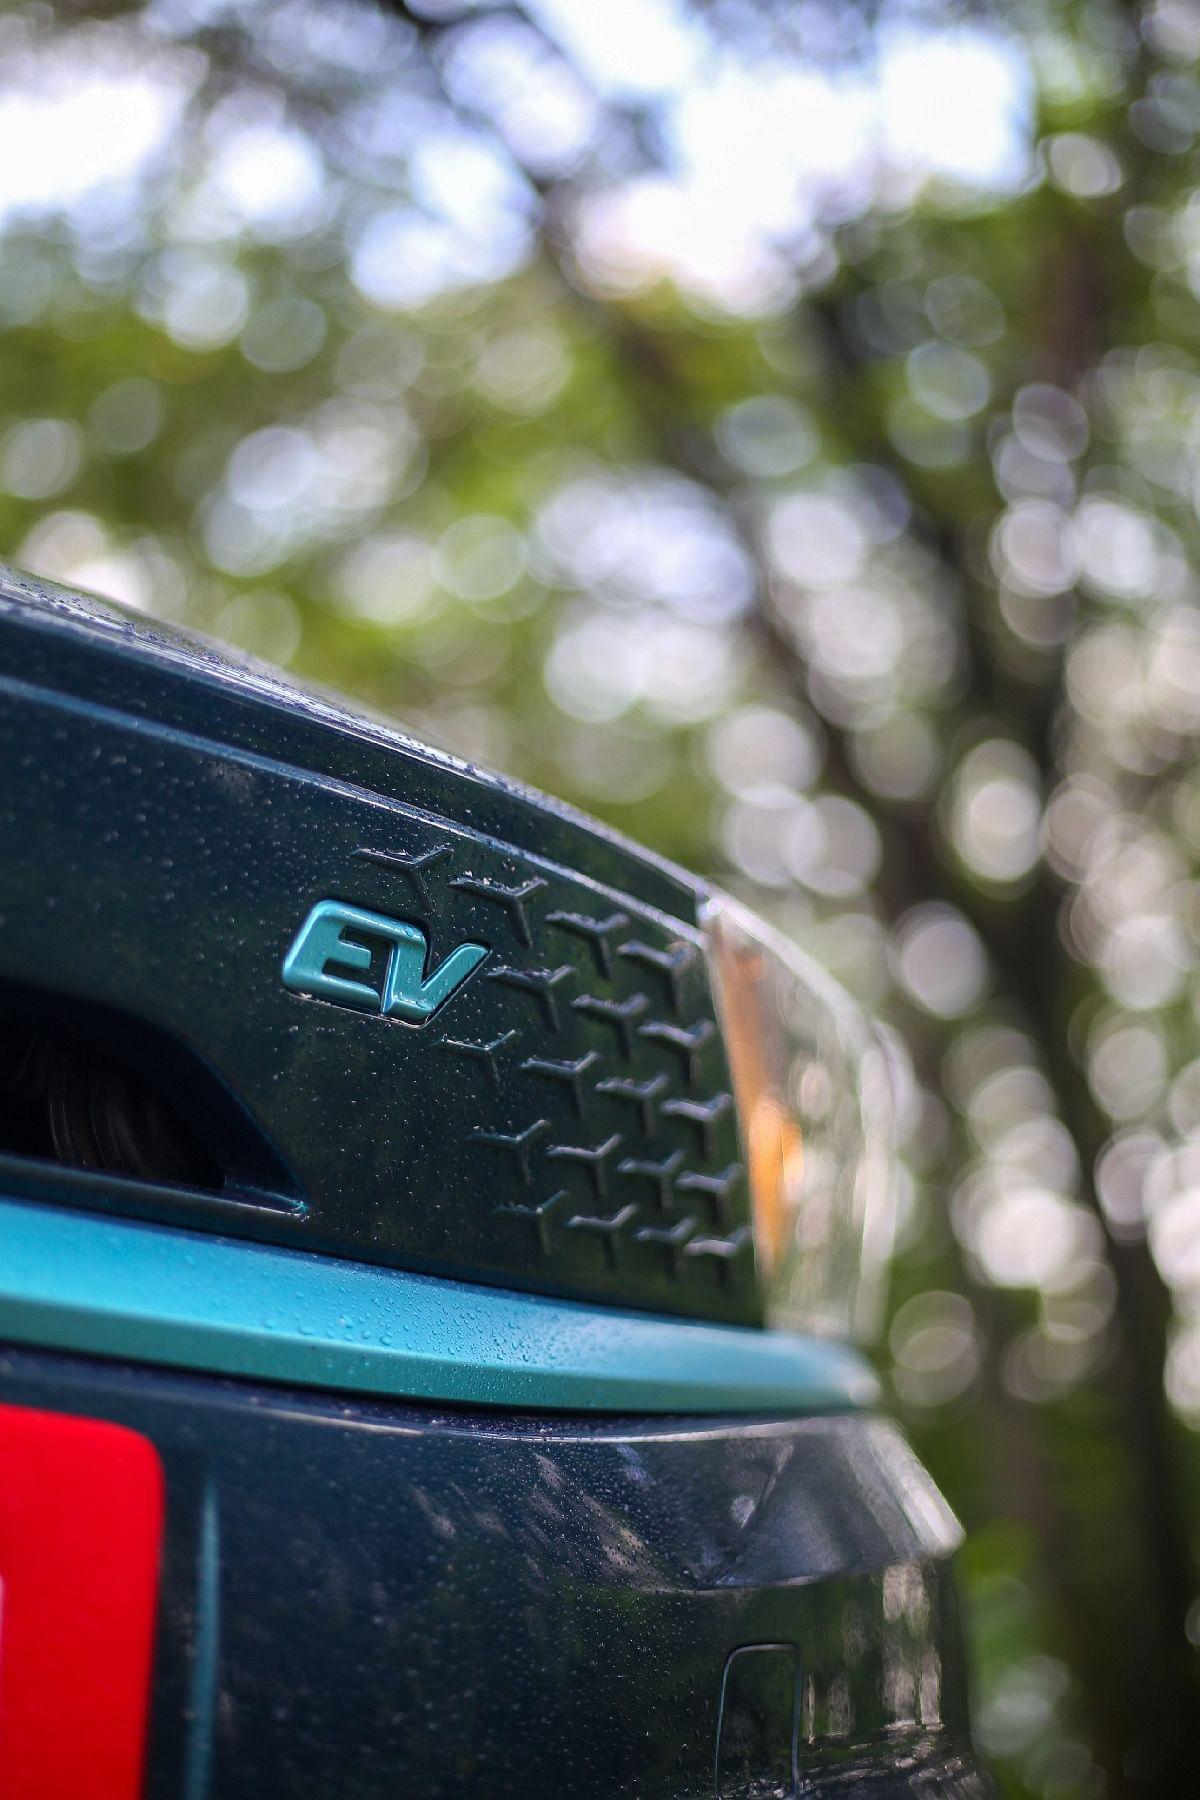 The 'grille' of the Tata Tigor EV gets the tri-arrow cutout pattern